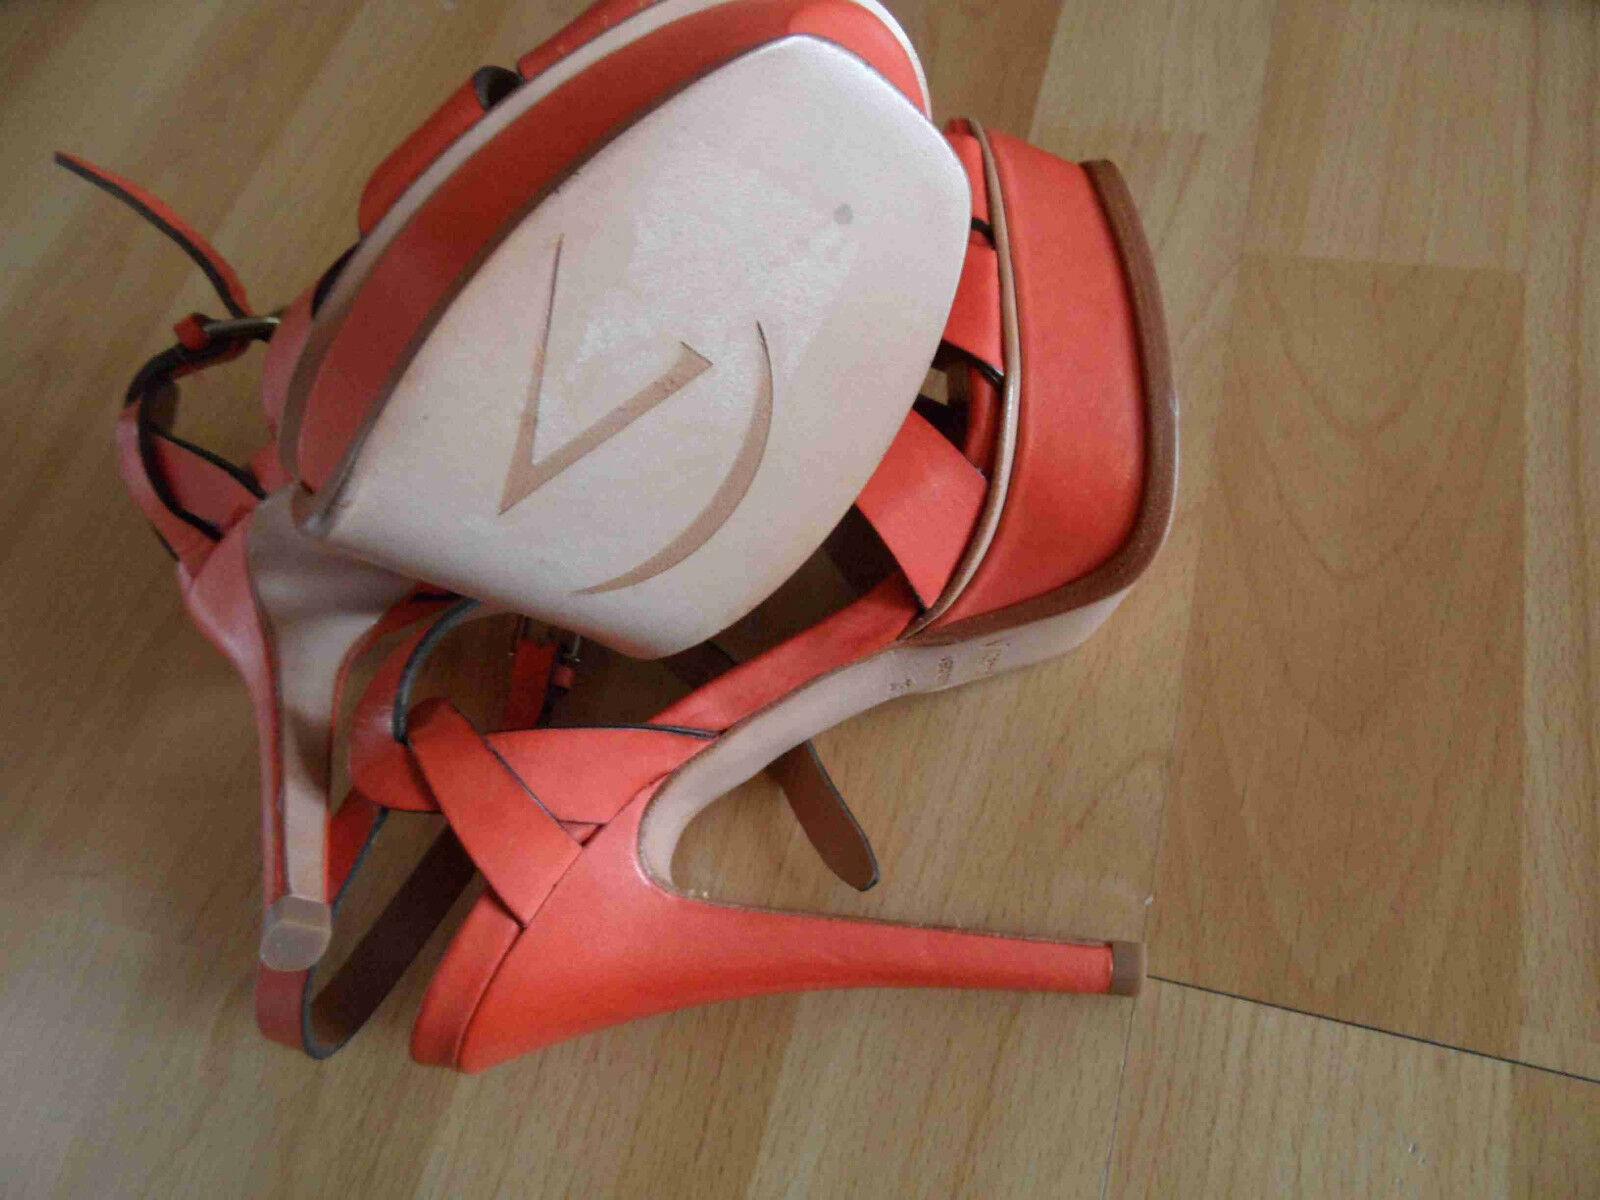 VICENZA stylische hohe Sandalen High Heels orange Gr. 35 35 35 NEU OA 1639a9